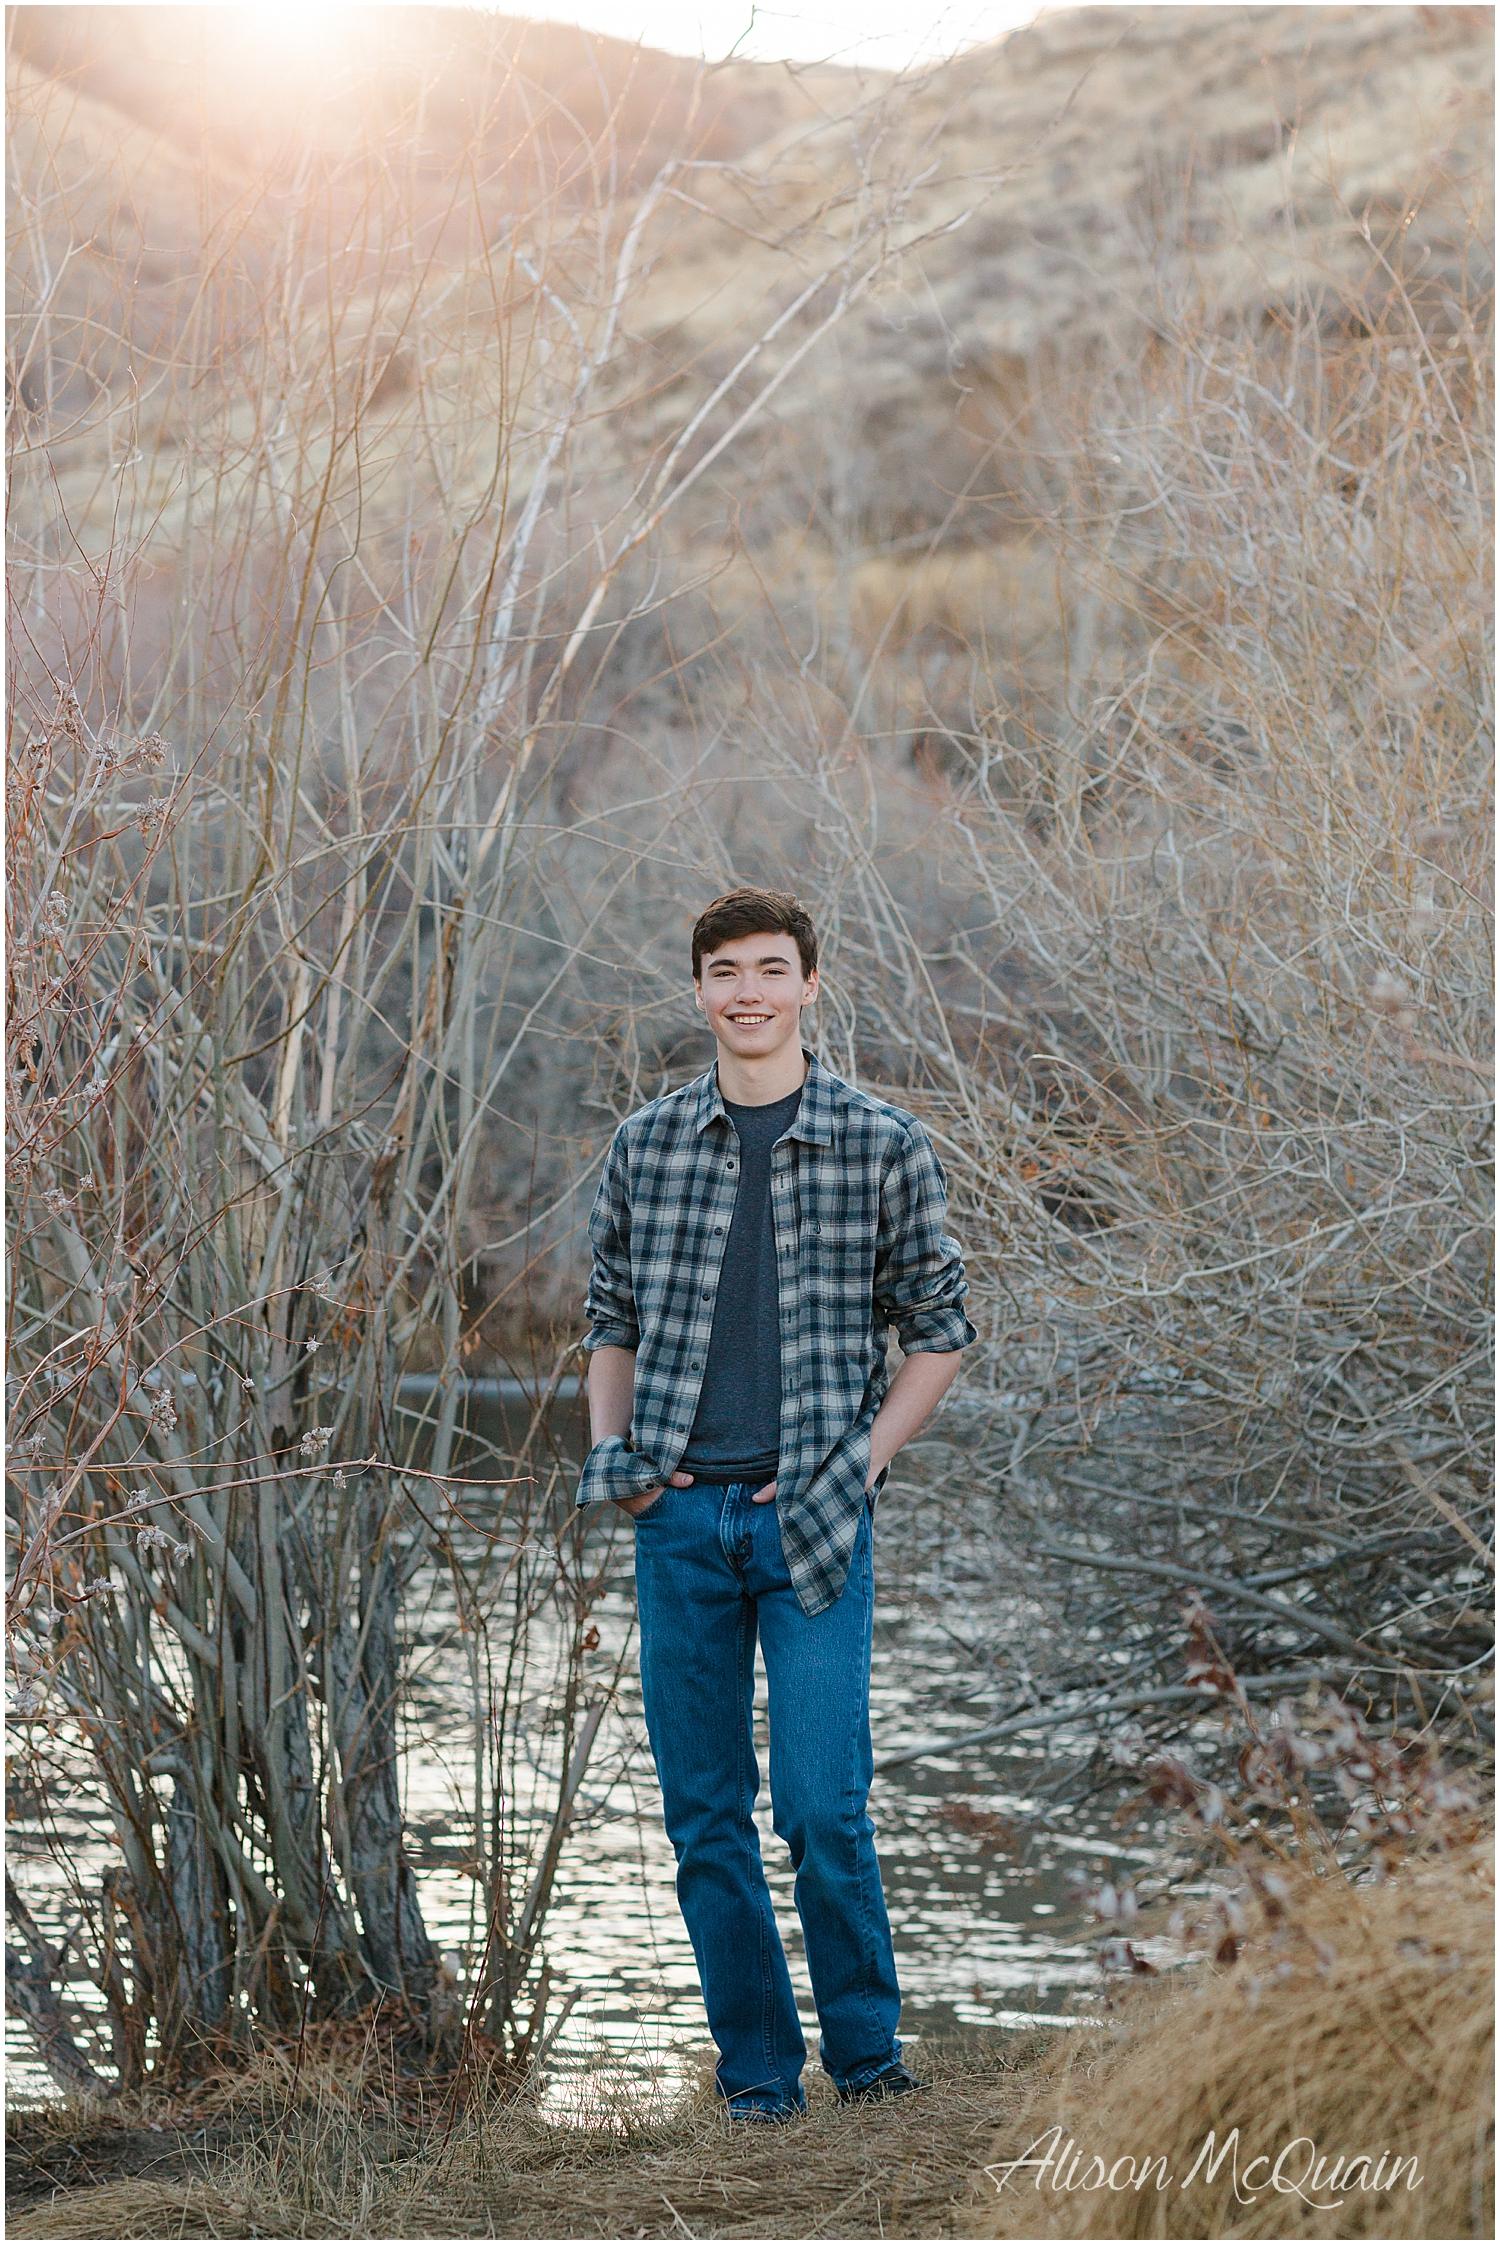 Jack_Senior_Portraits_Reno_NV_01_2019_AlisonMcQuainPhotography_0022.jpg